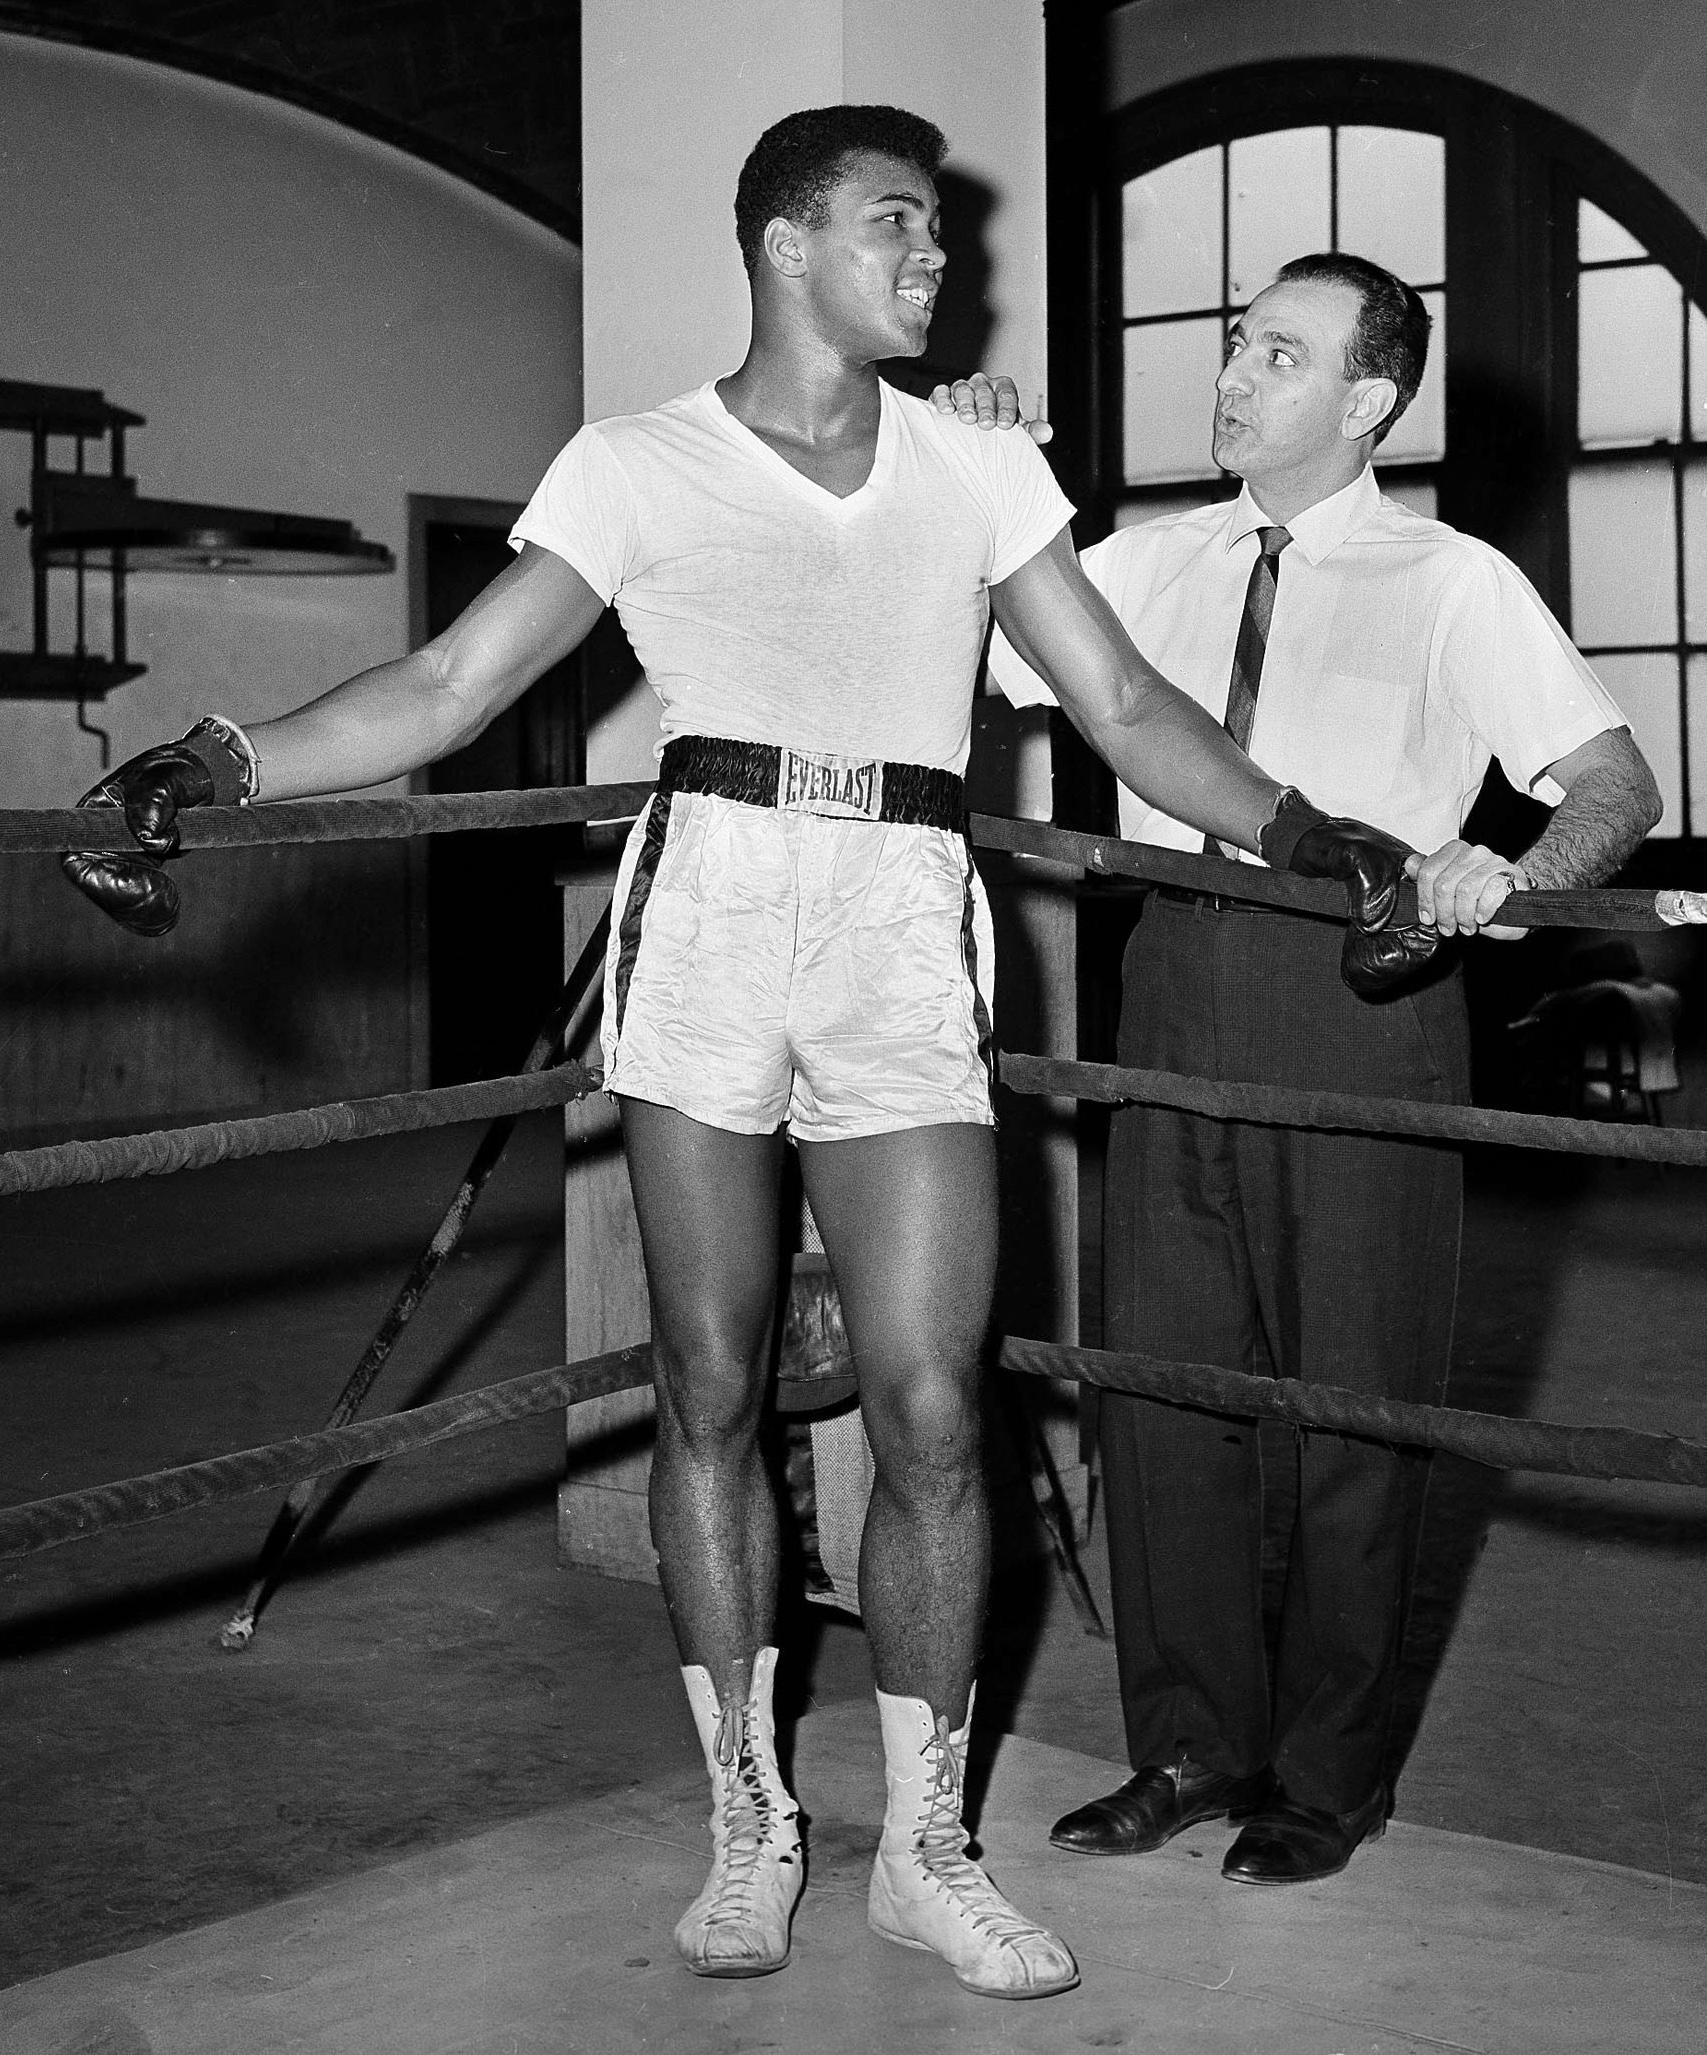 Ali, Dundee . City Parks Gym, New York,1962